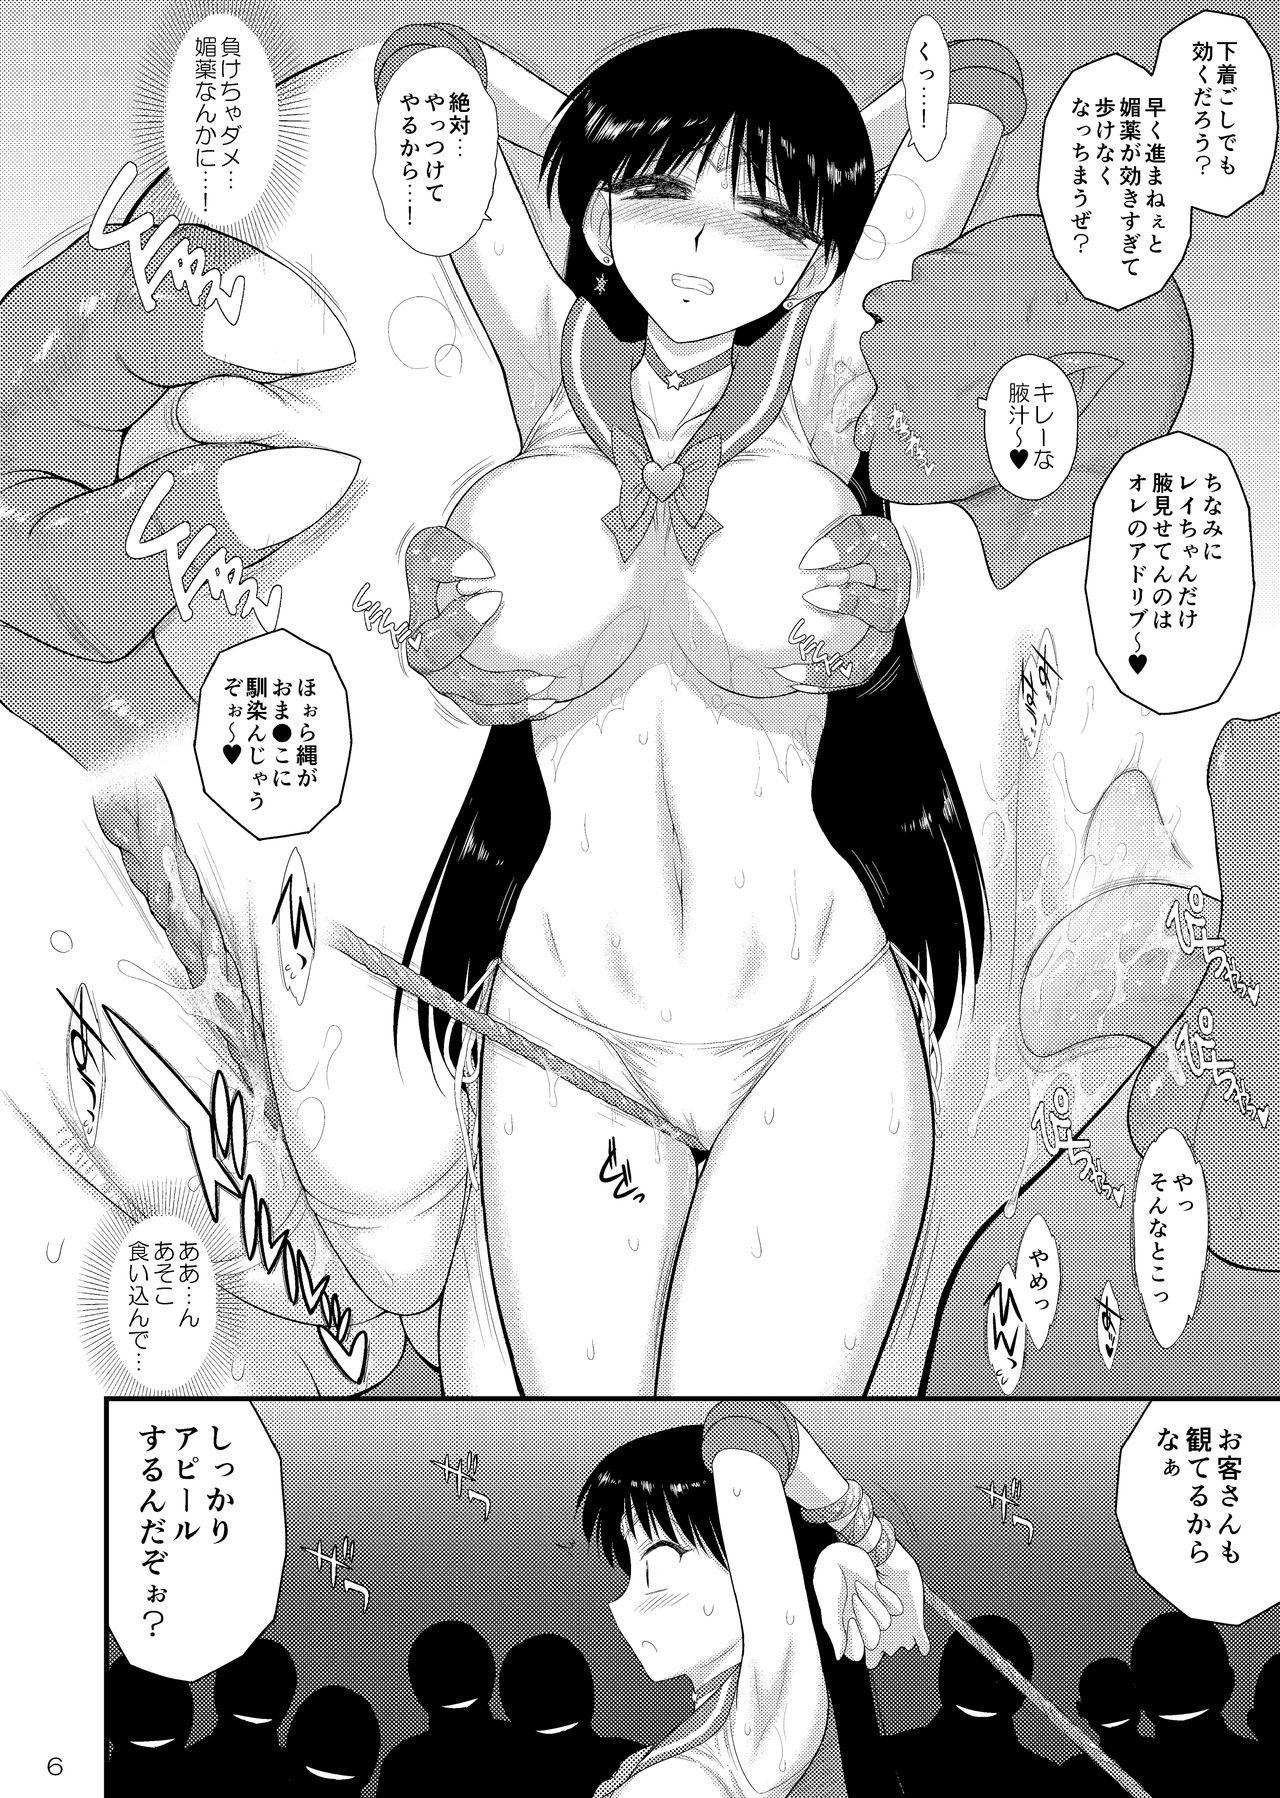 The Fertilization of Rei Hino 39